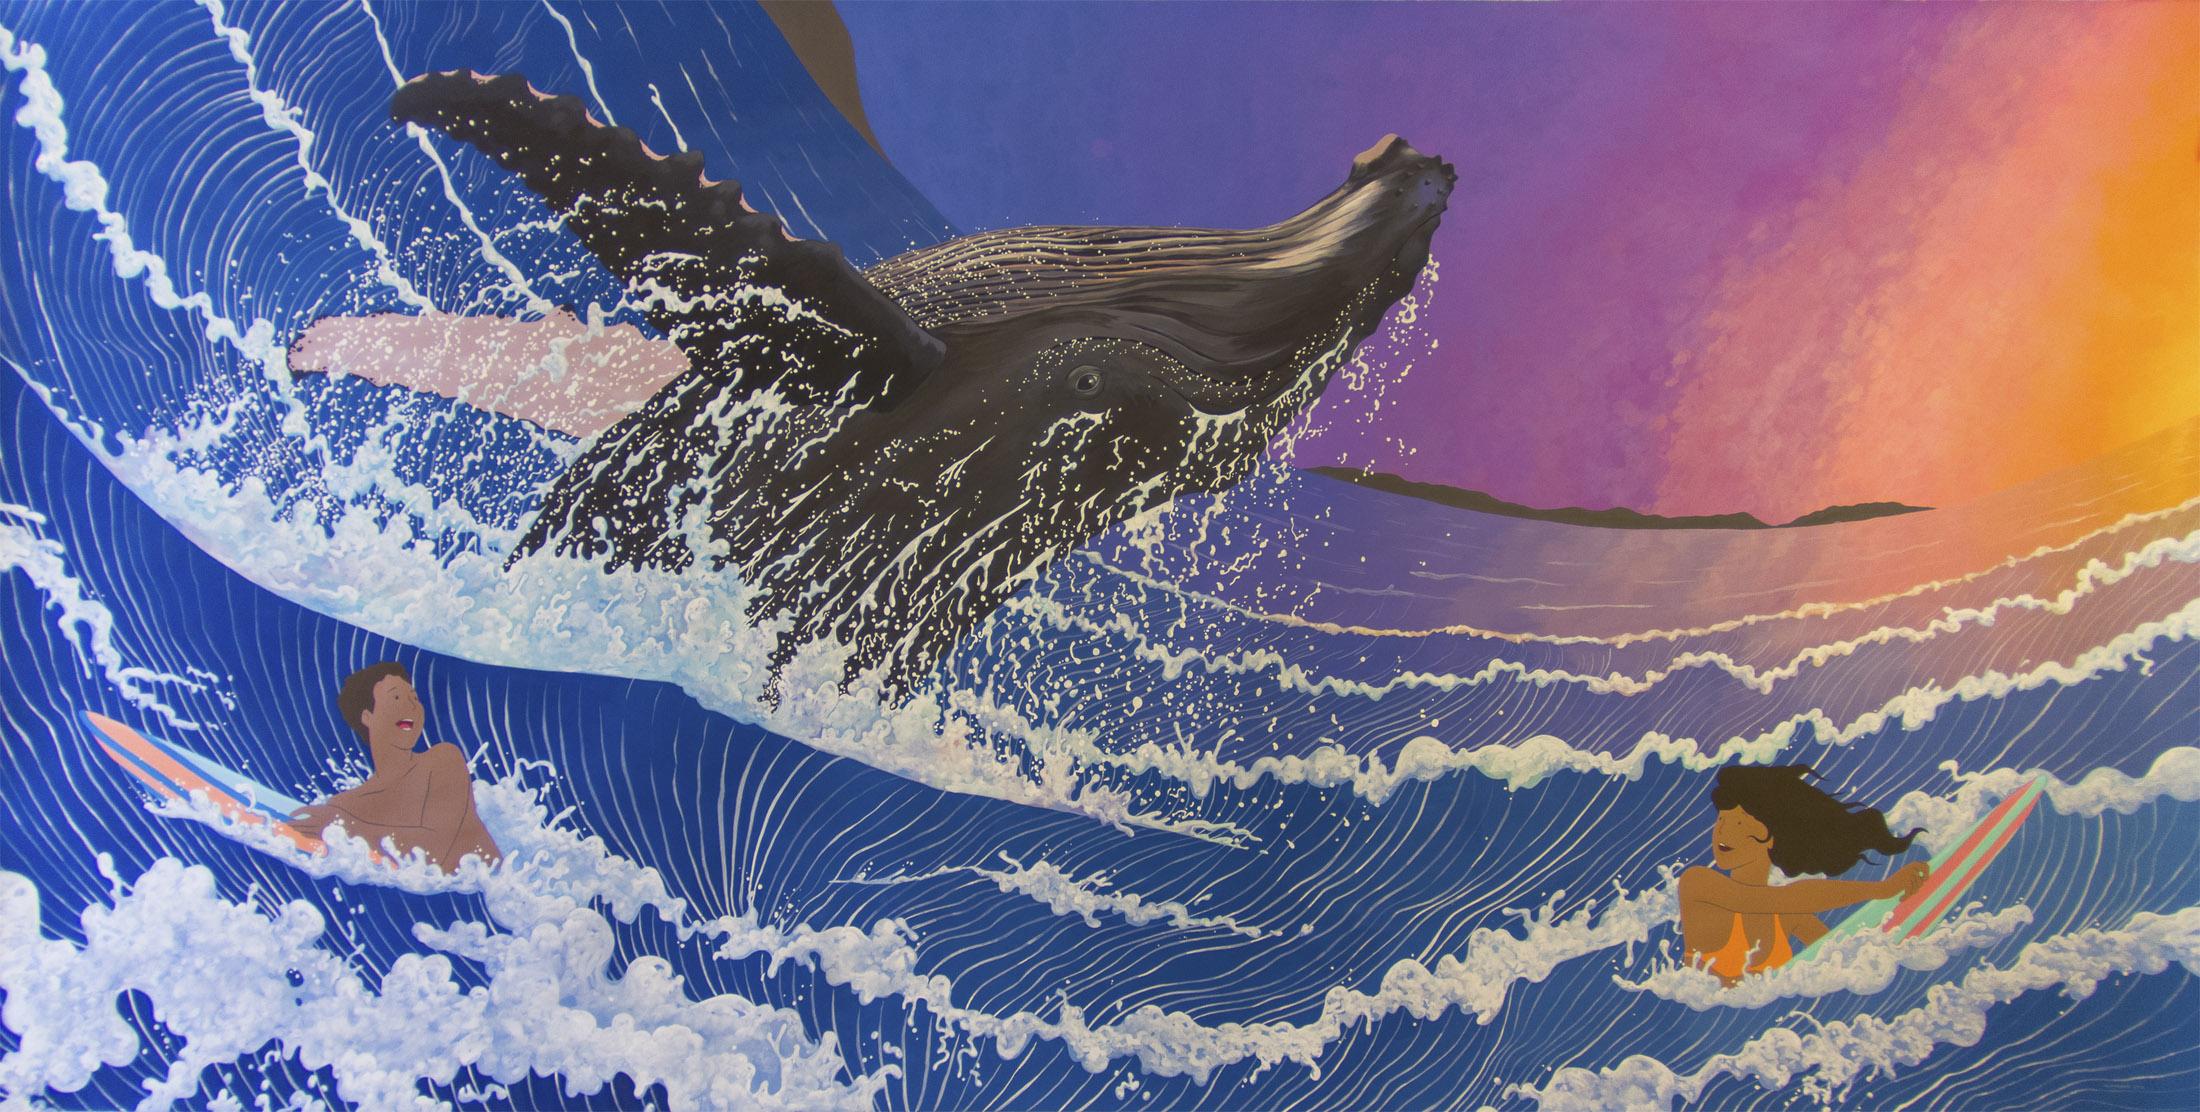 Wallpaper : ocean, ART, nature, animal, painting, acrylic